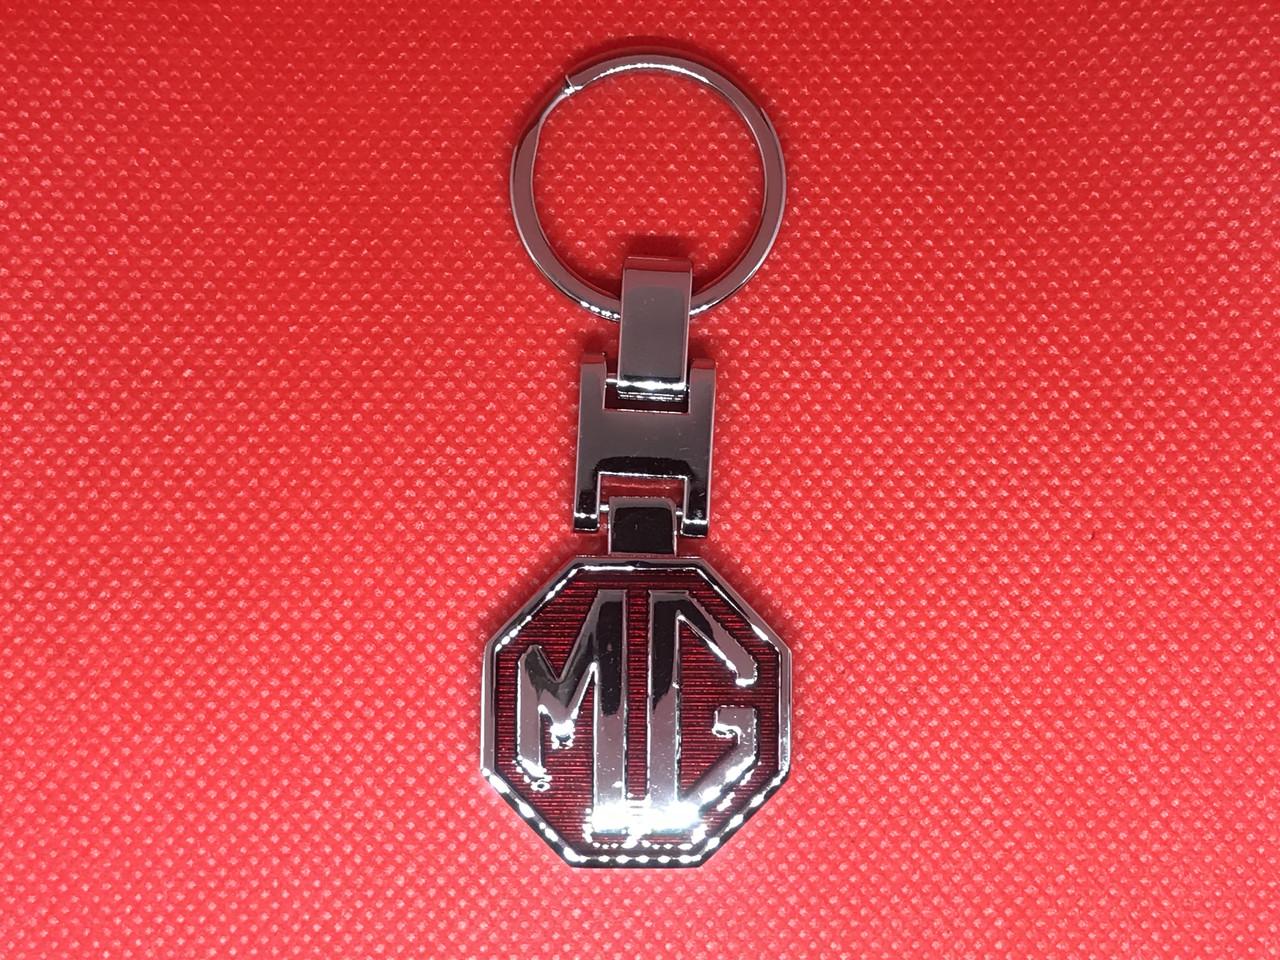 Брелок металлический для авто ключей MG (МГ)